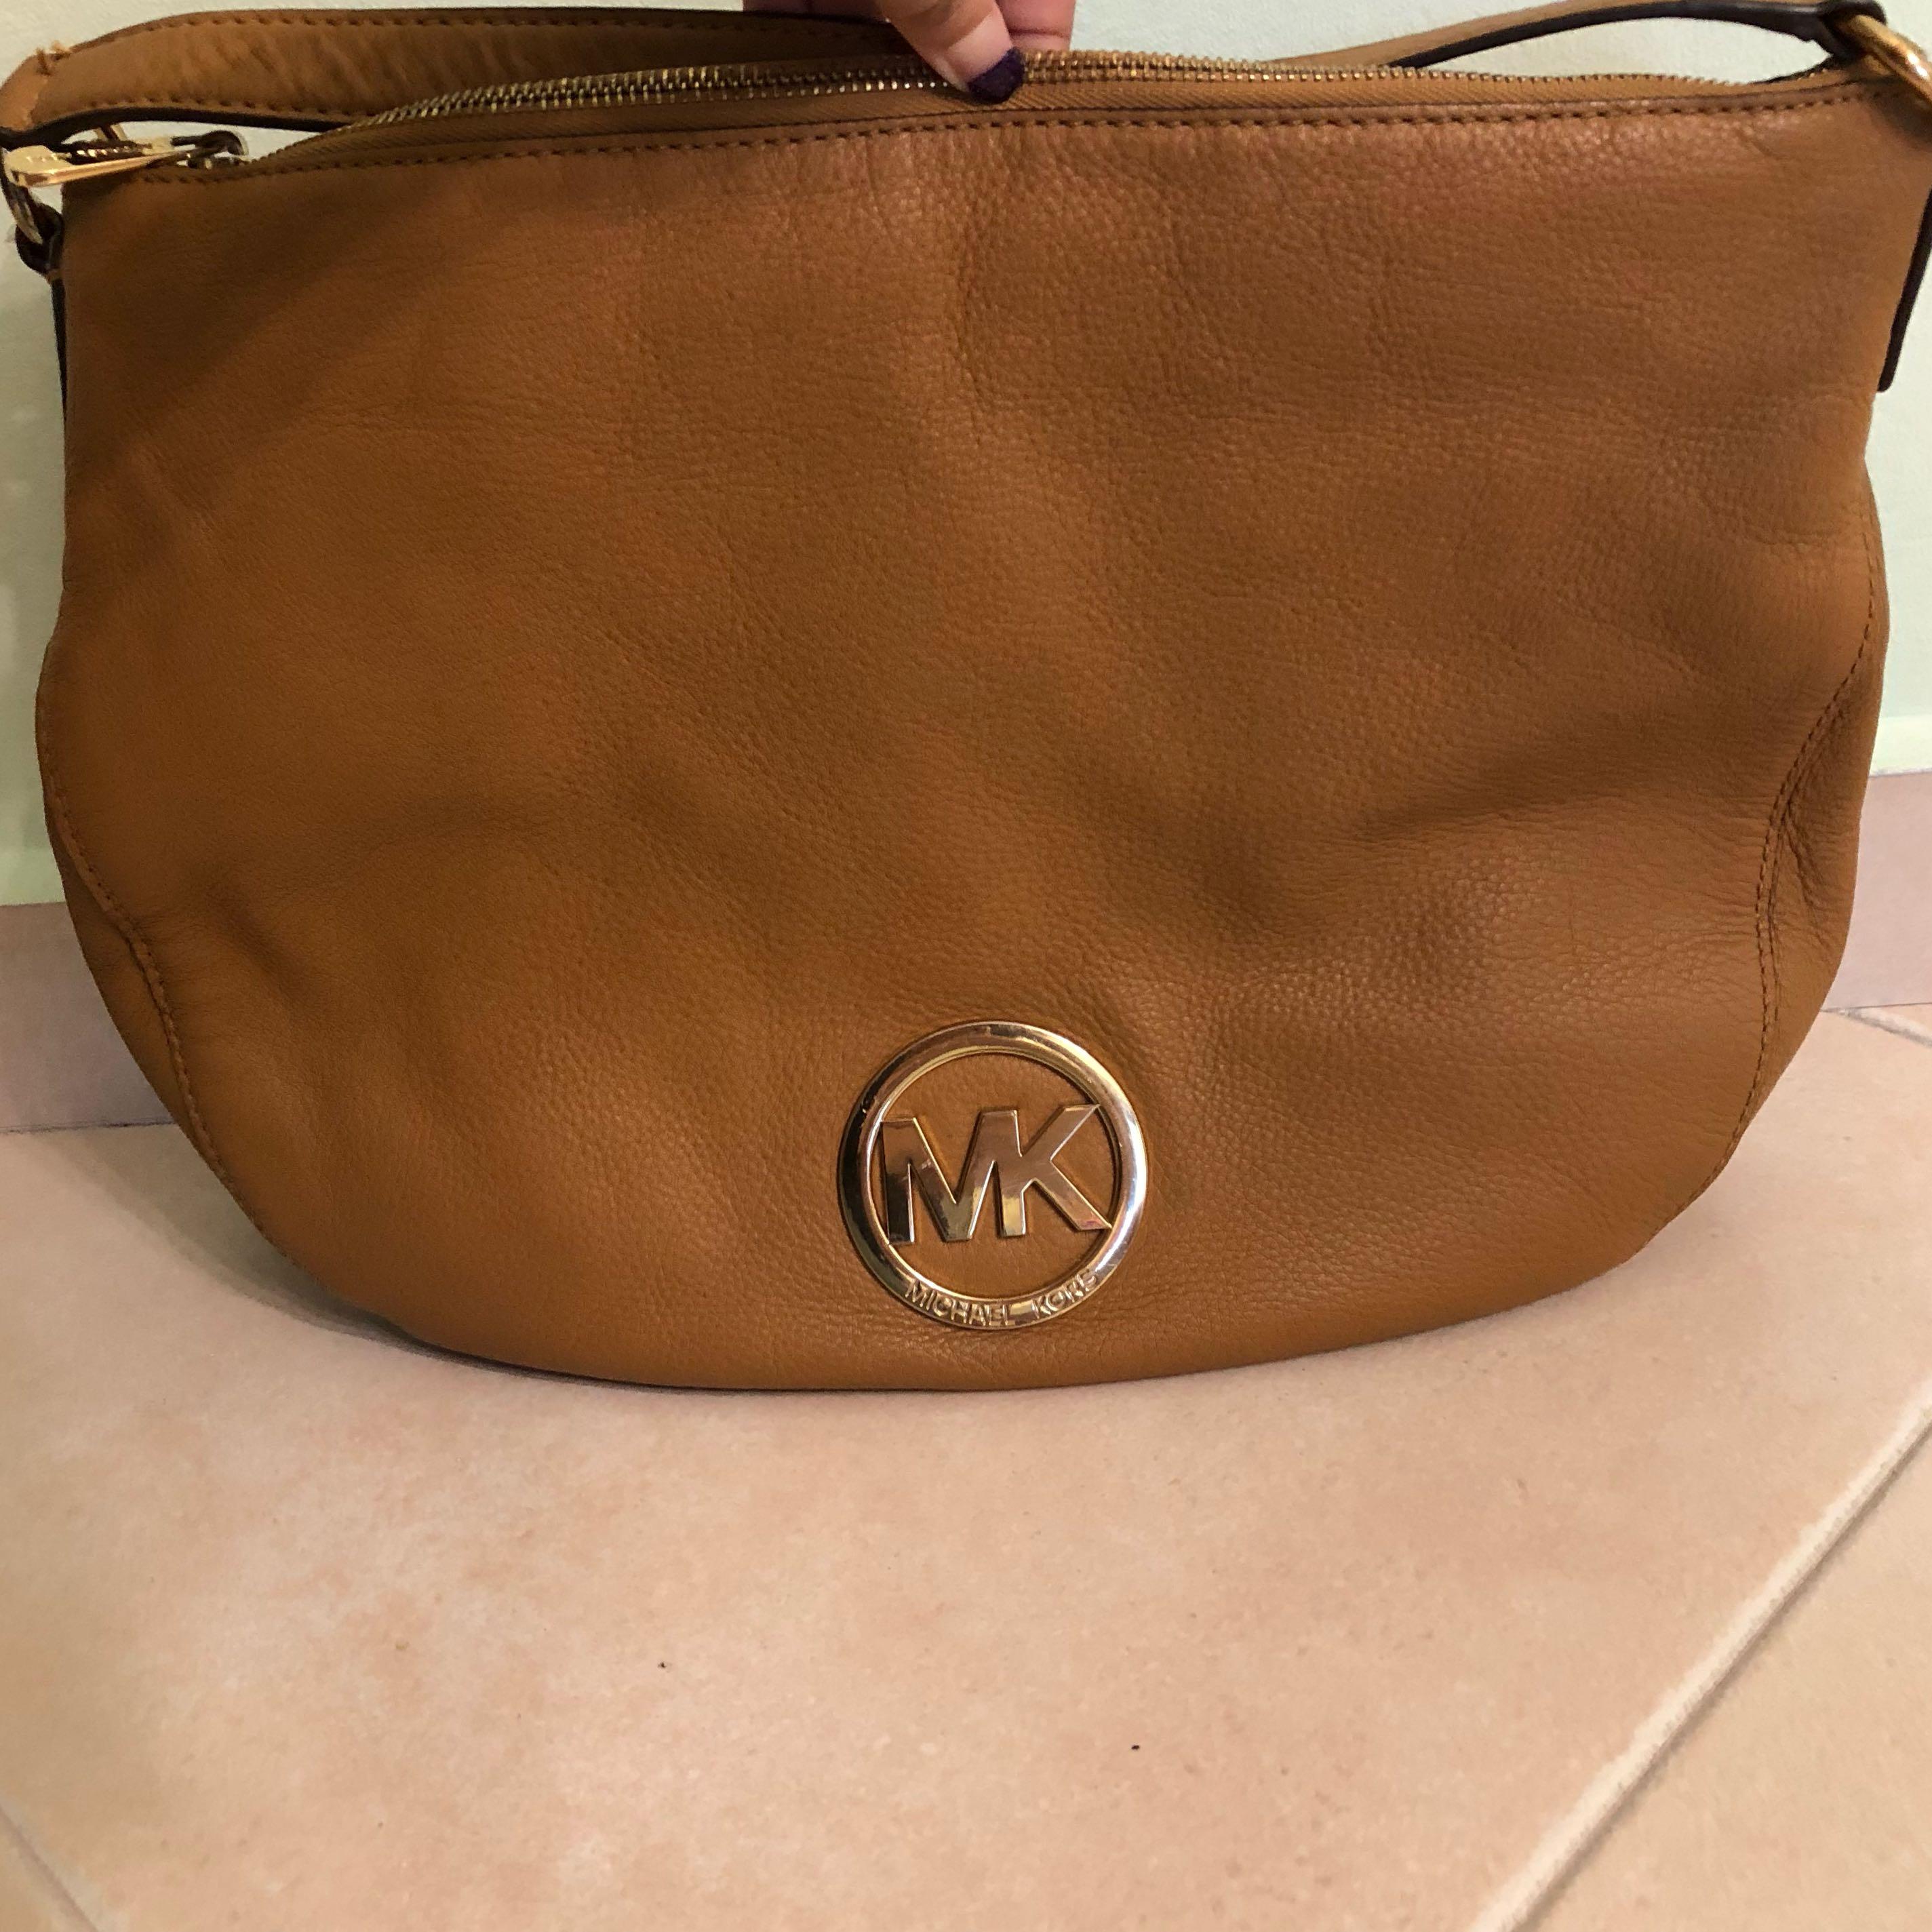 a6b7d87738b4 Michael Kors handbag, Luxury, Bags & Wallets, Handbags on Carousell